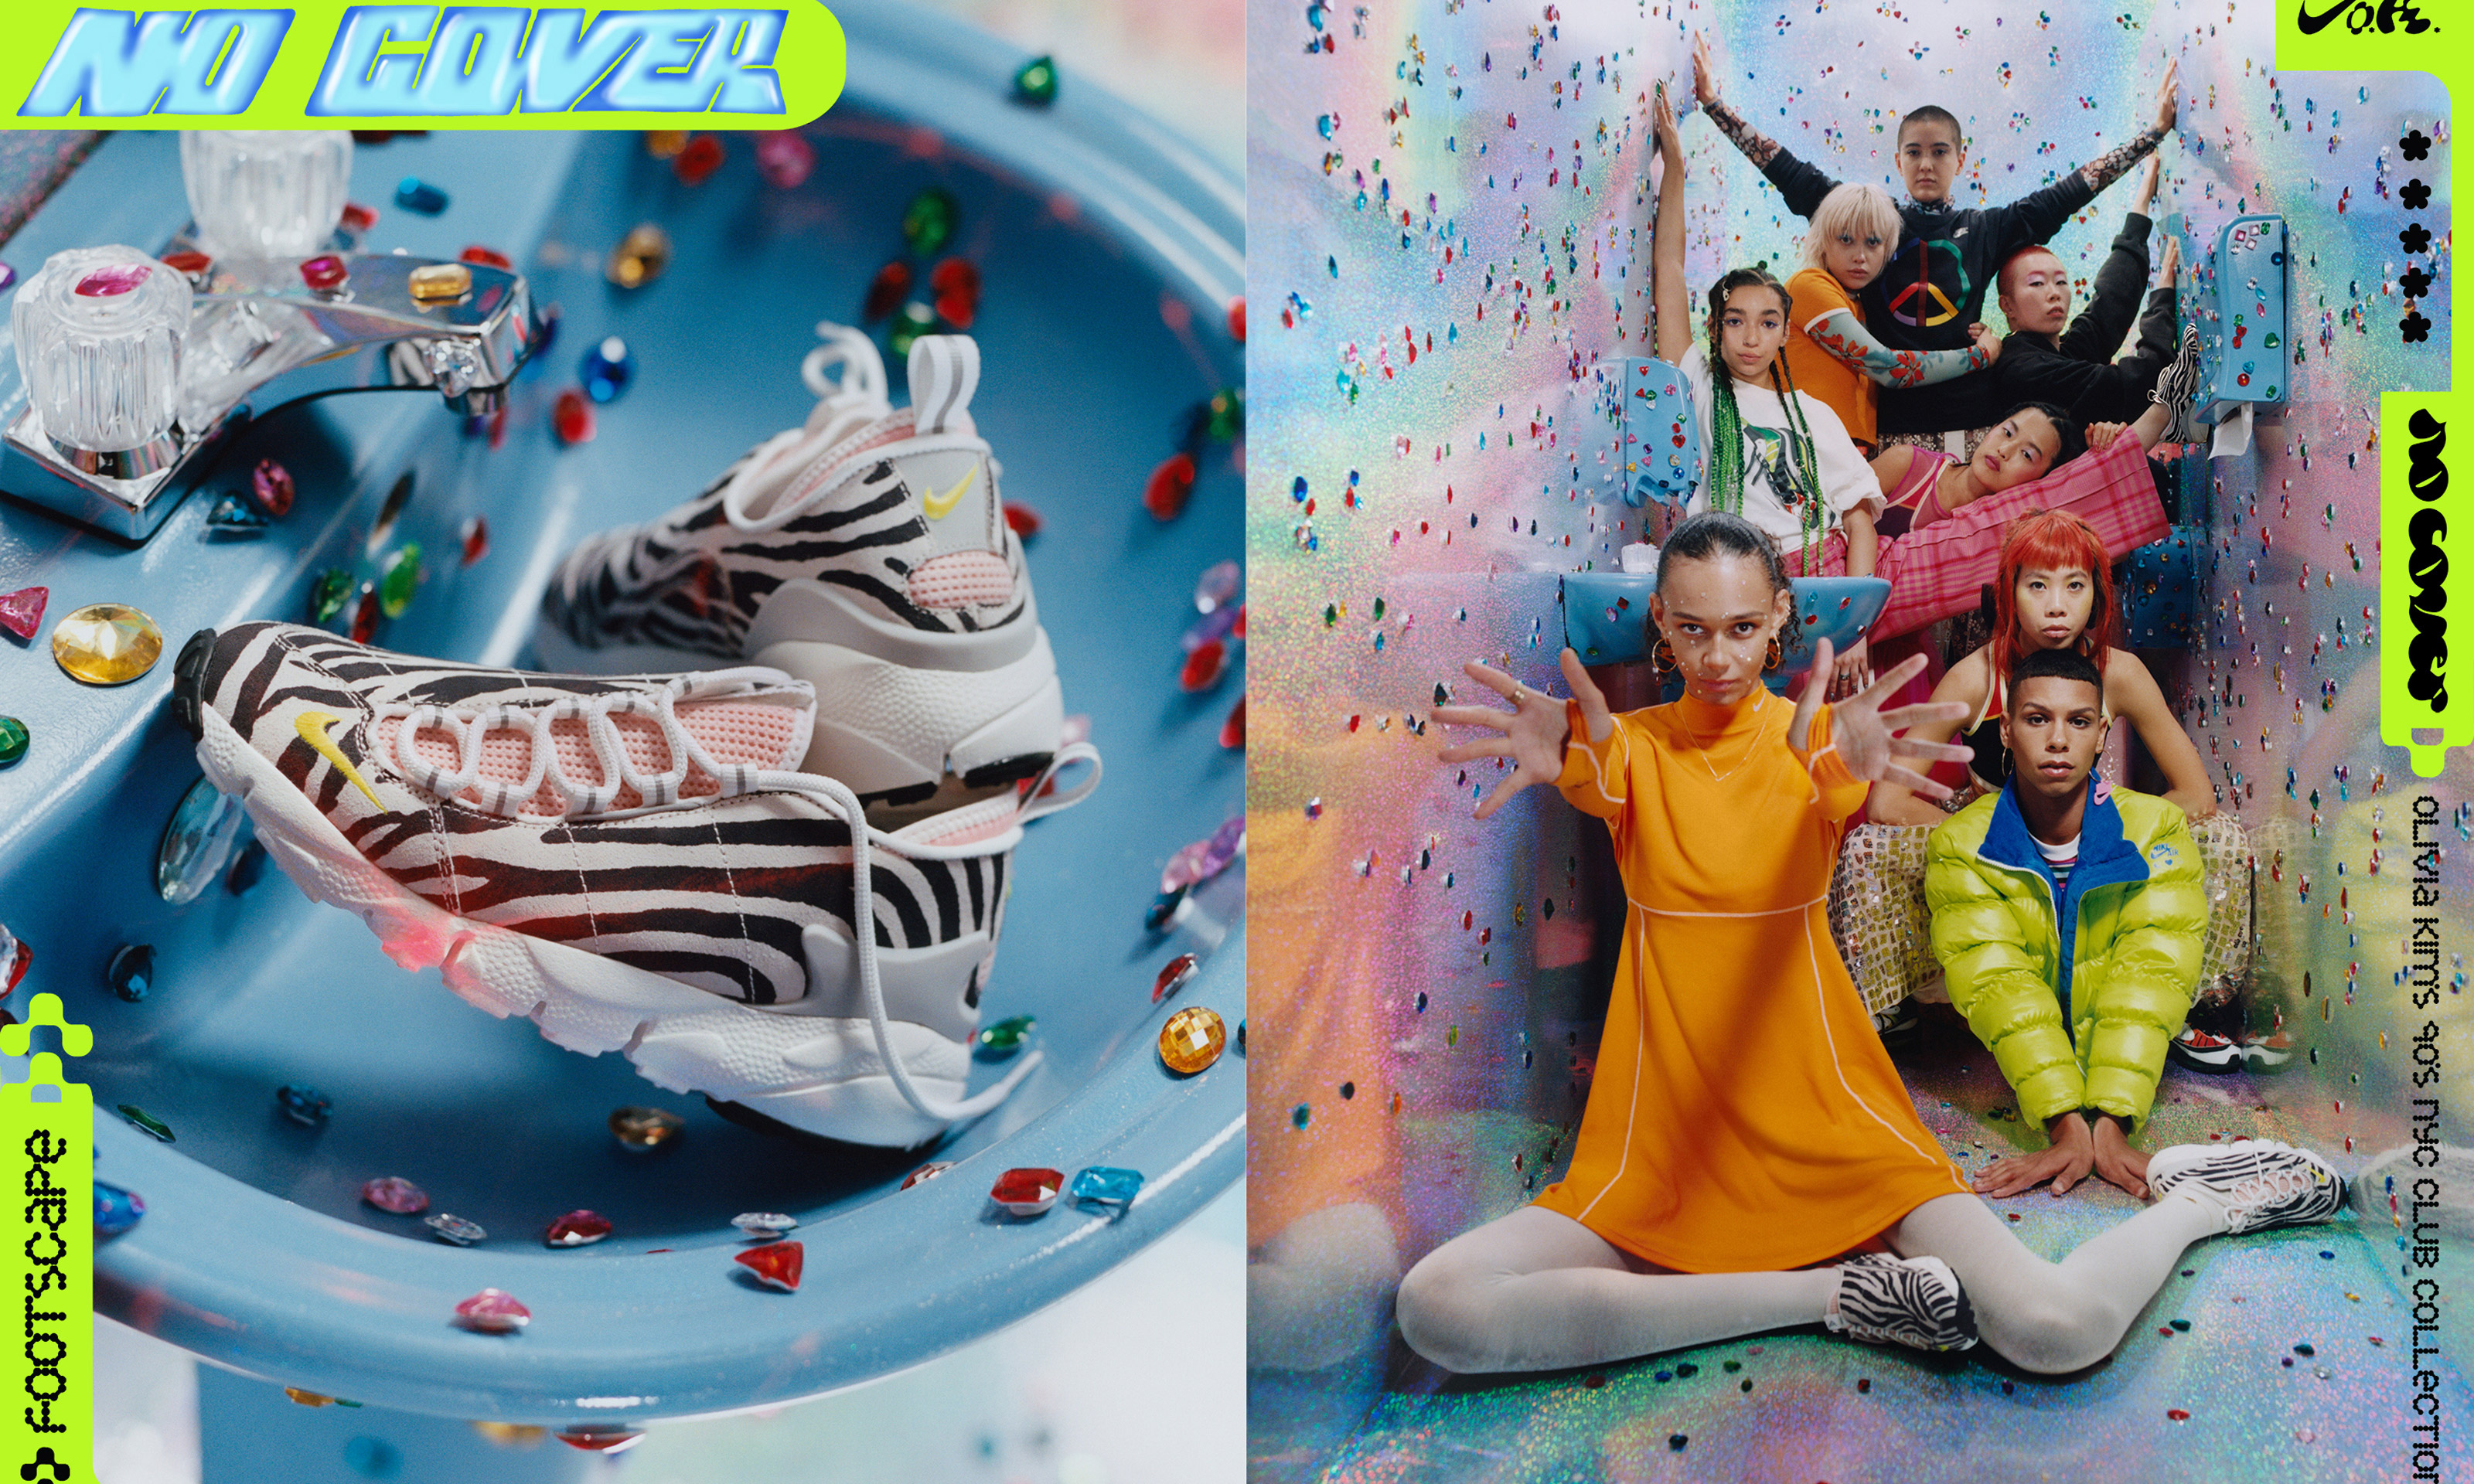 重现 90s 纽约街头,Olivia Kim x Nike「No Cover」特辑释出